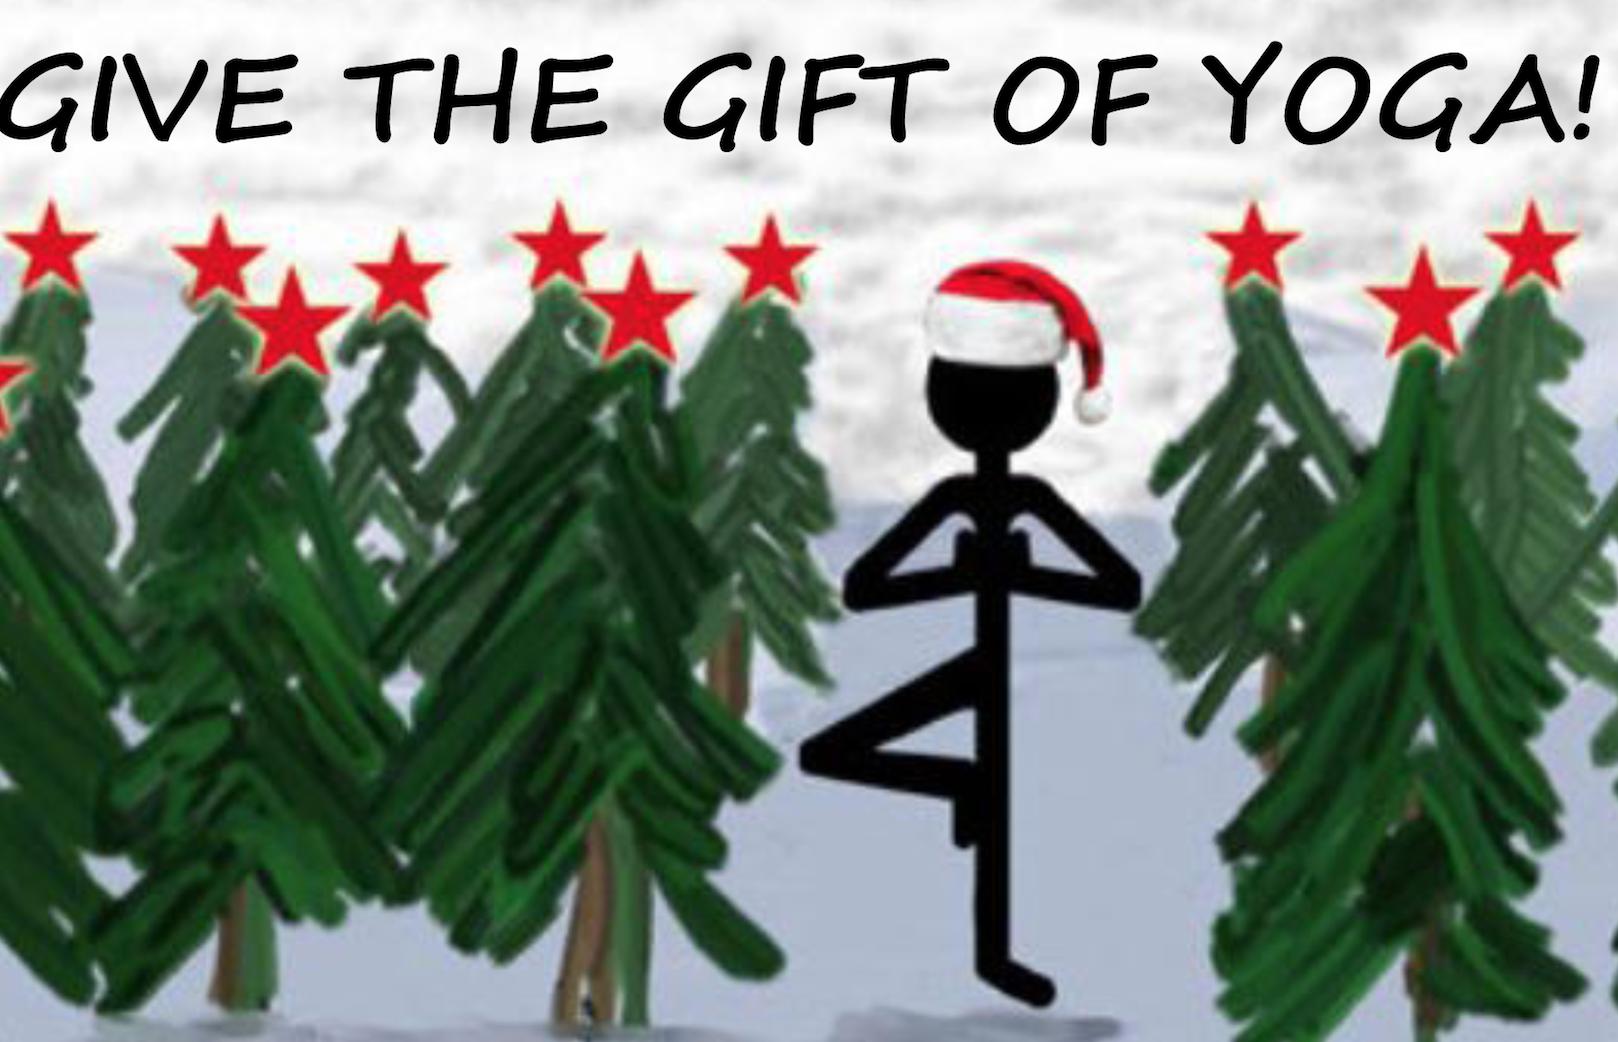 gift of yoga.png